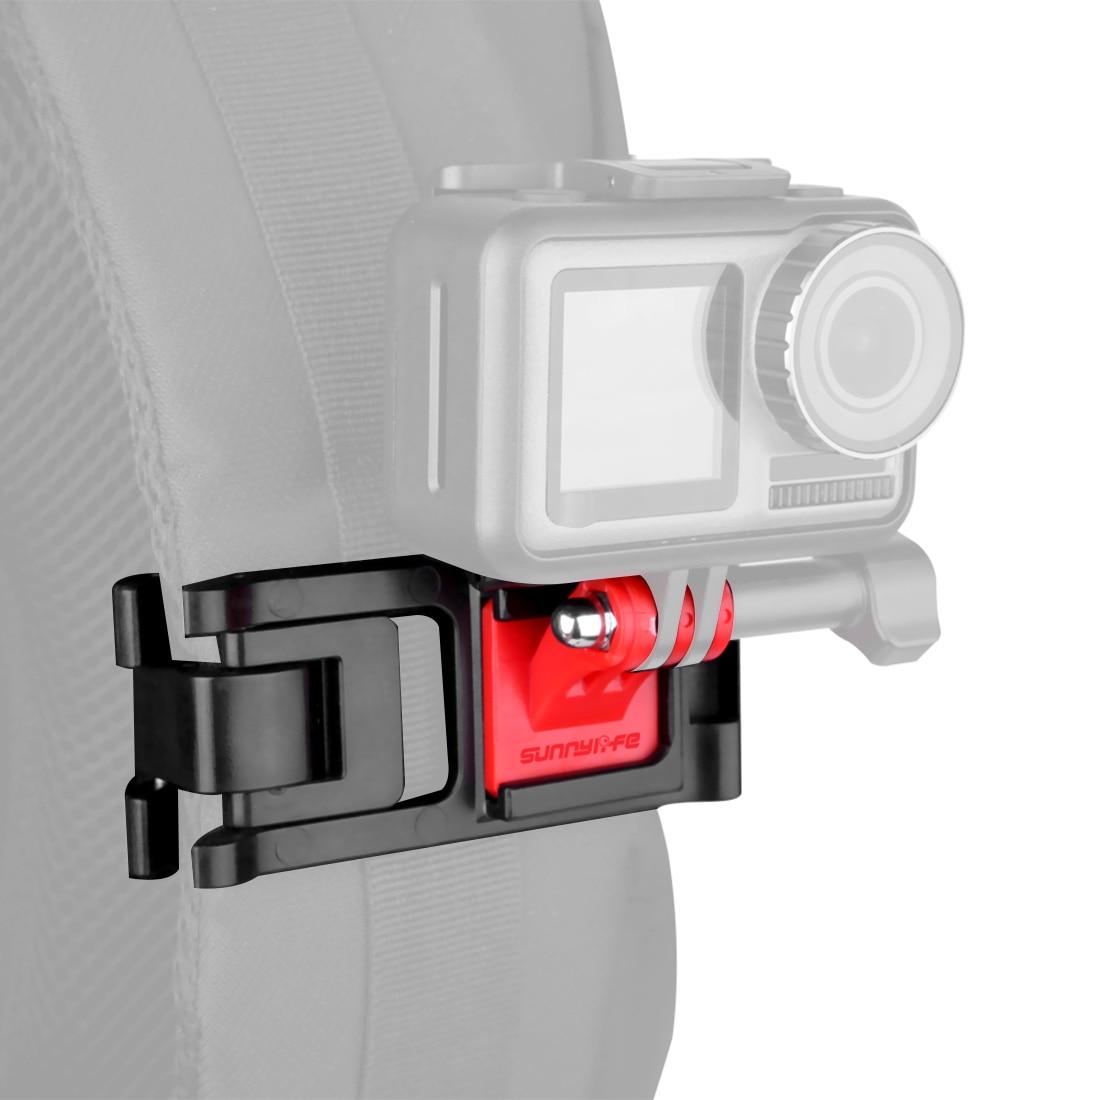 Adjustable Action Camera Backpack Strap Holder Clip Universal For DJI OSMO Pocket GoPro Hero 8 7 6 5 SJCAM XiaoYi Clamp Mount